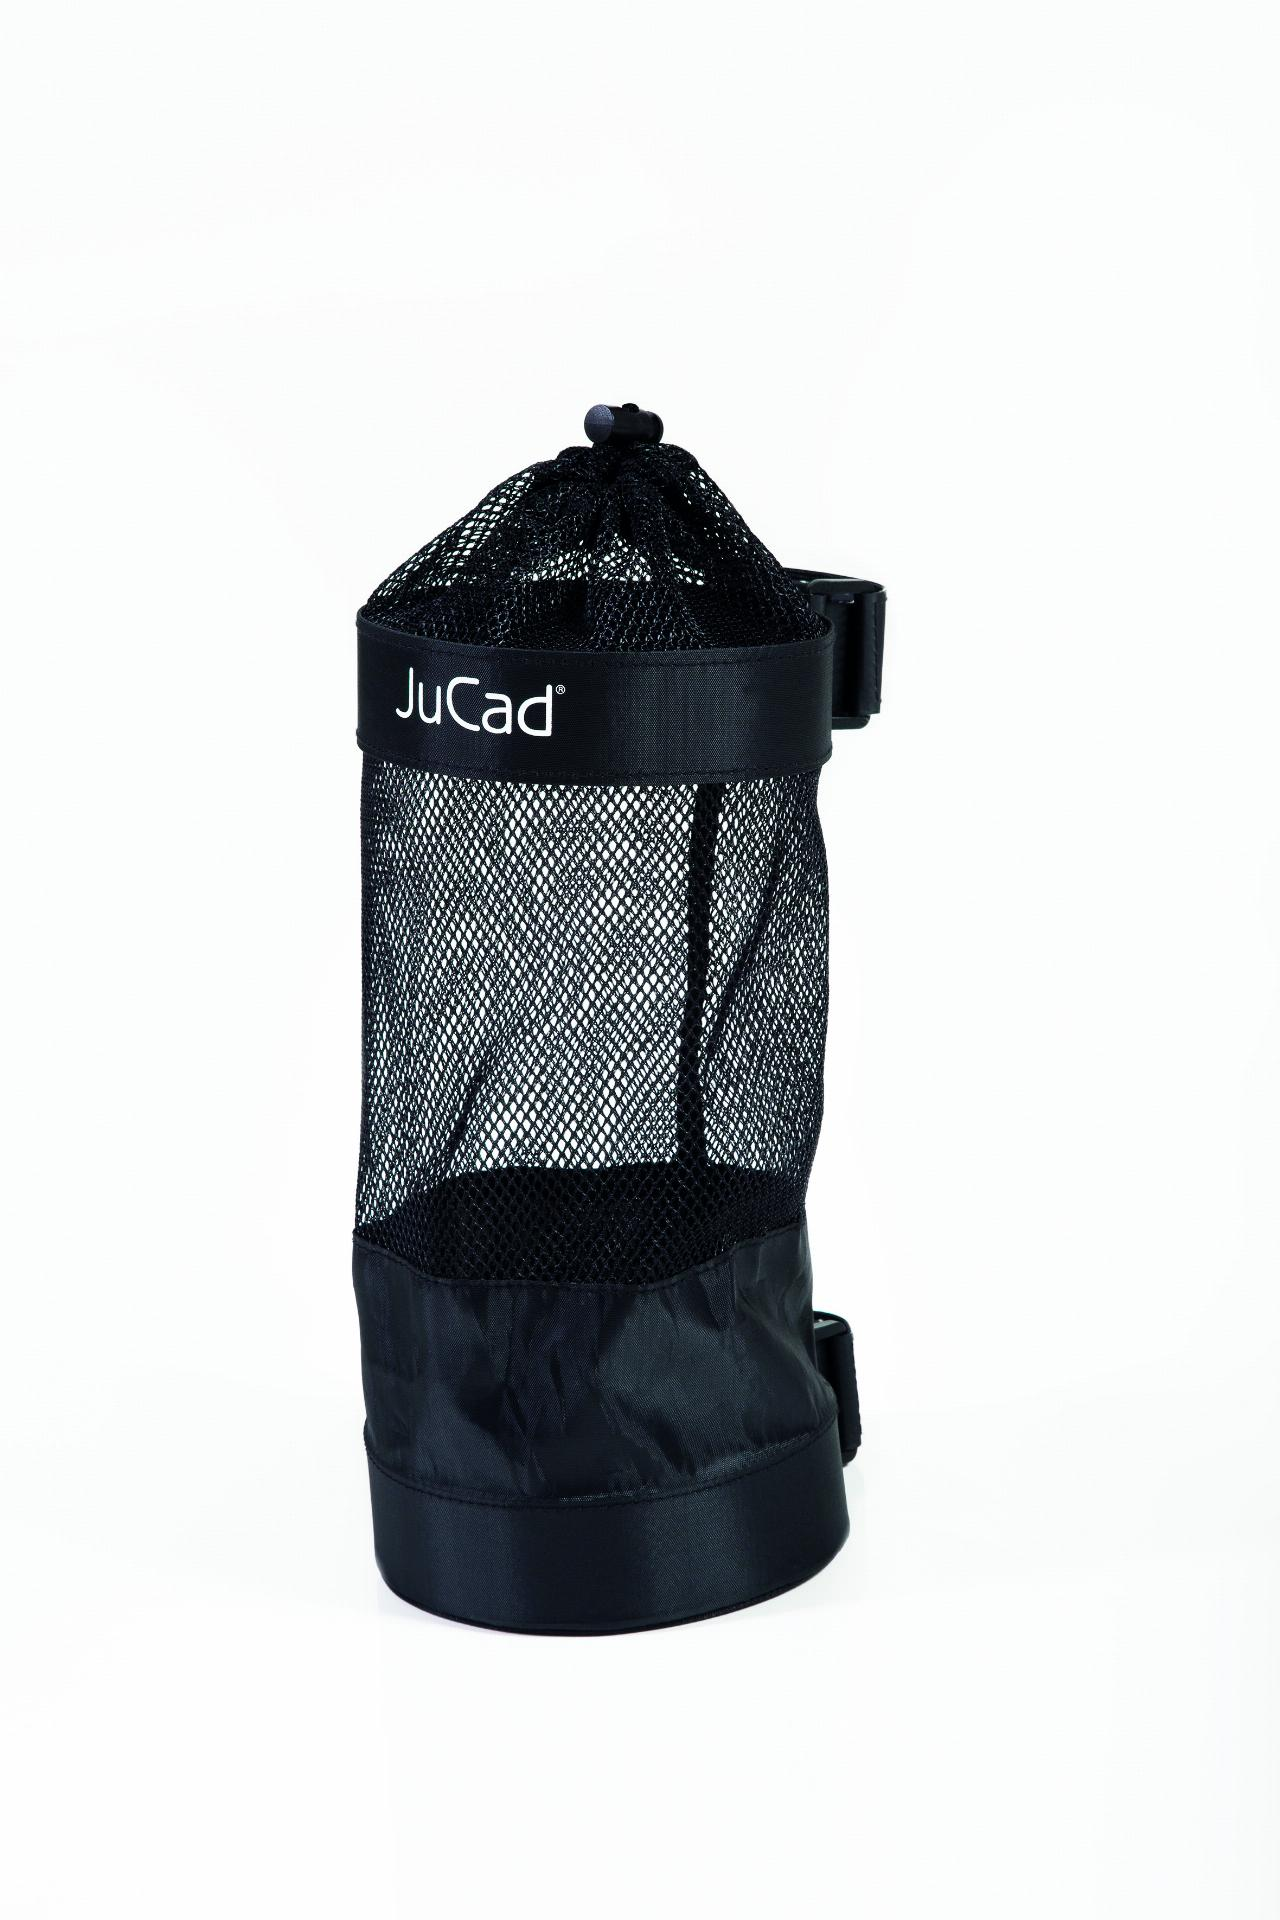 JuCad - Accessoiretasche